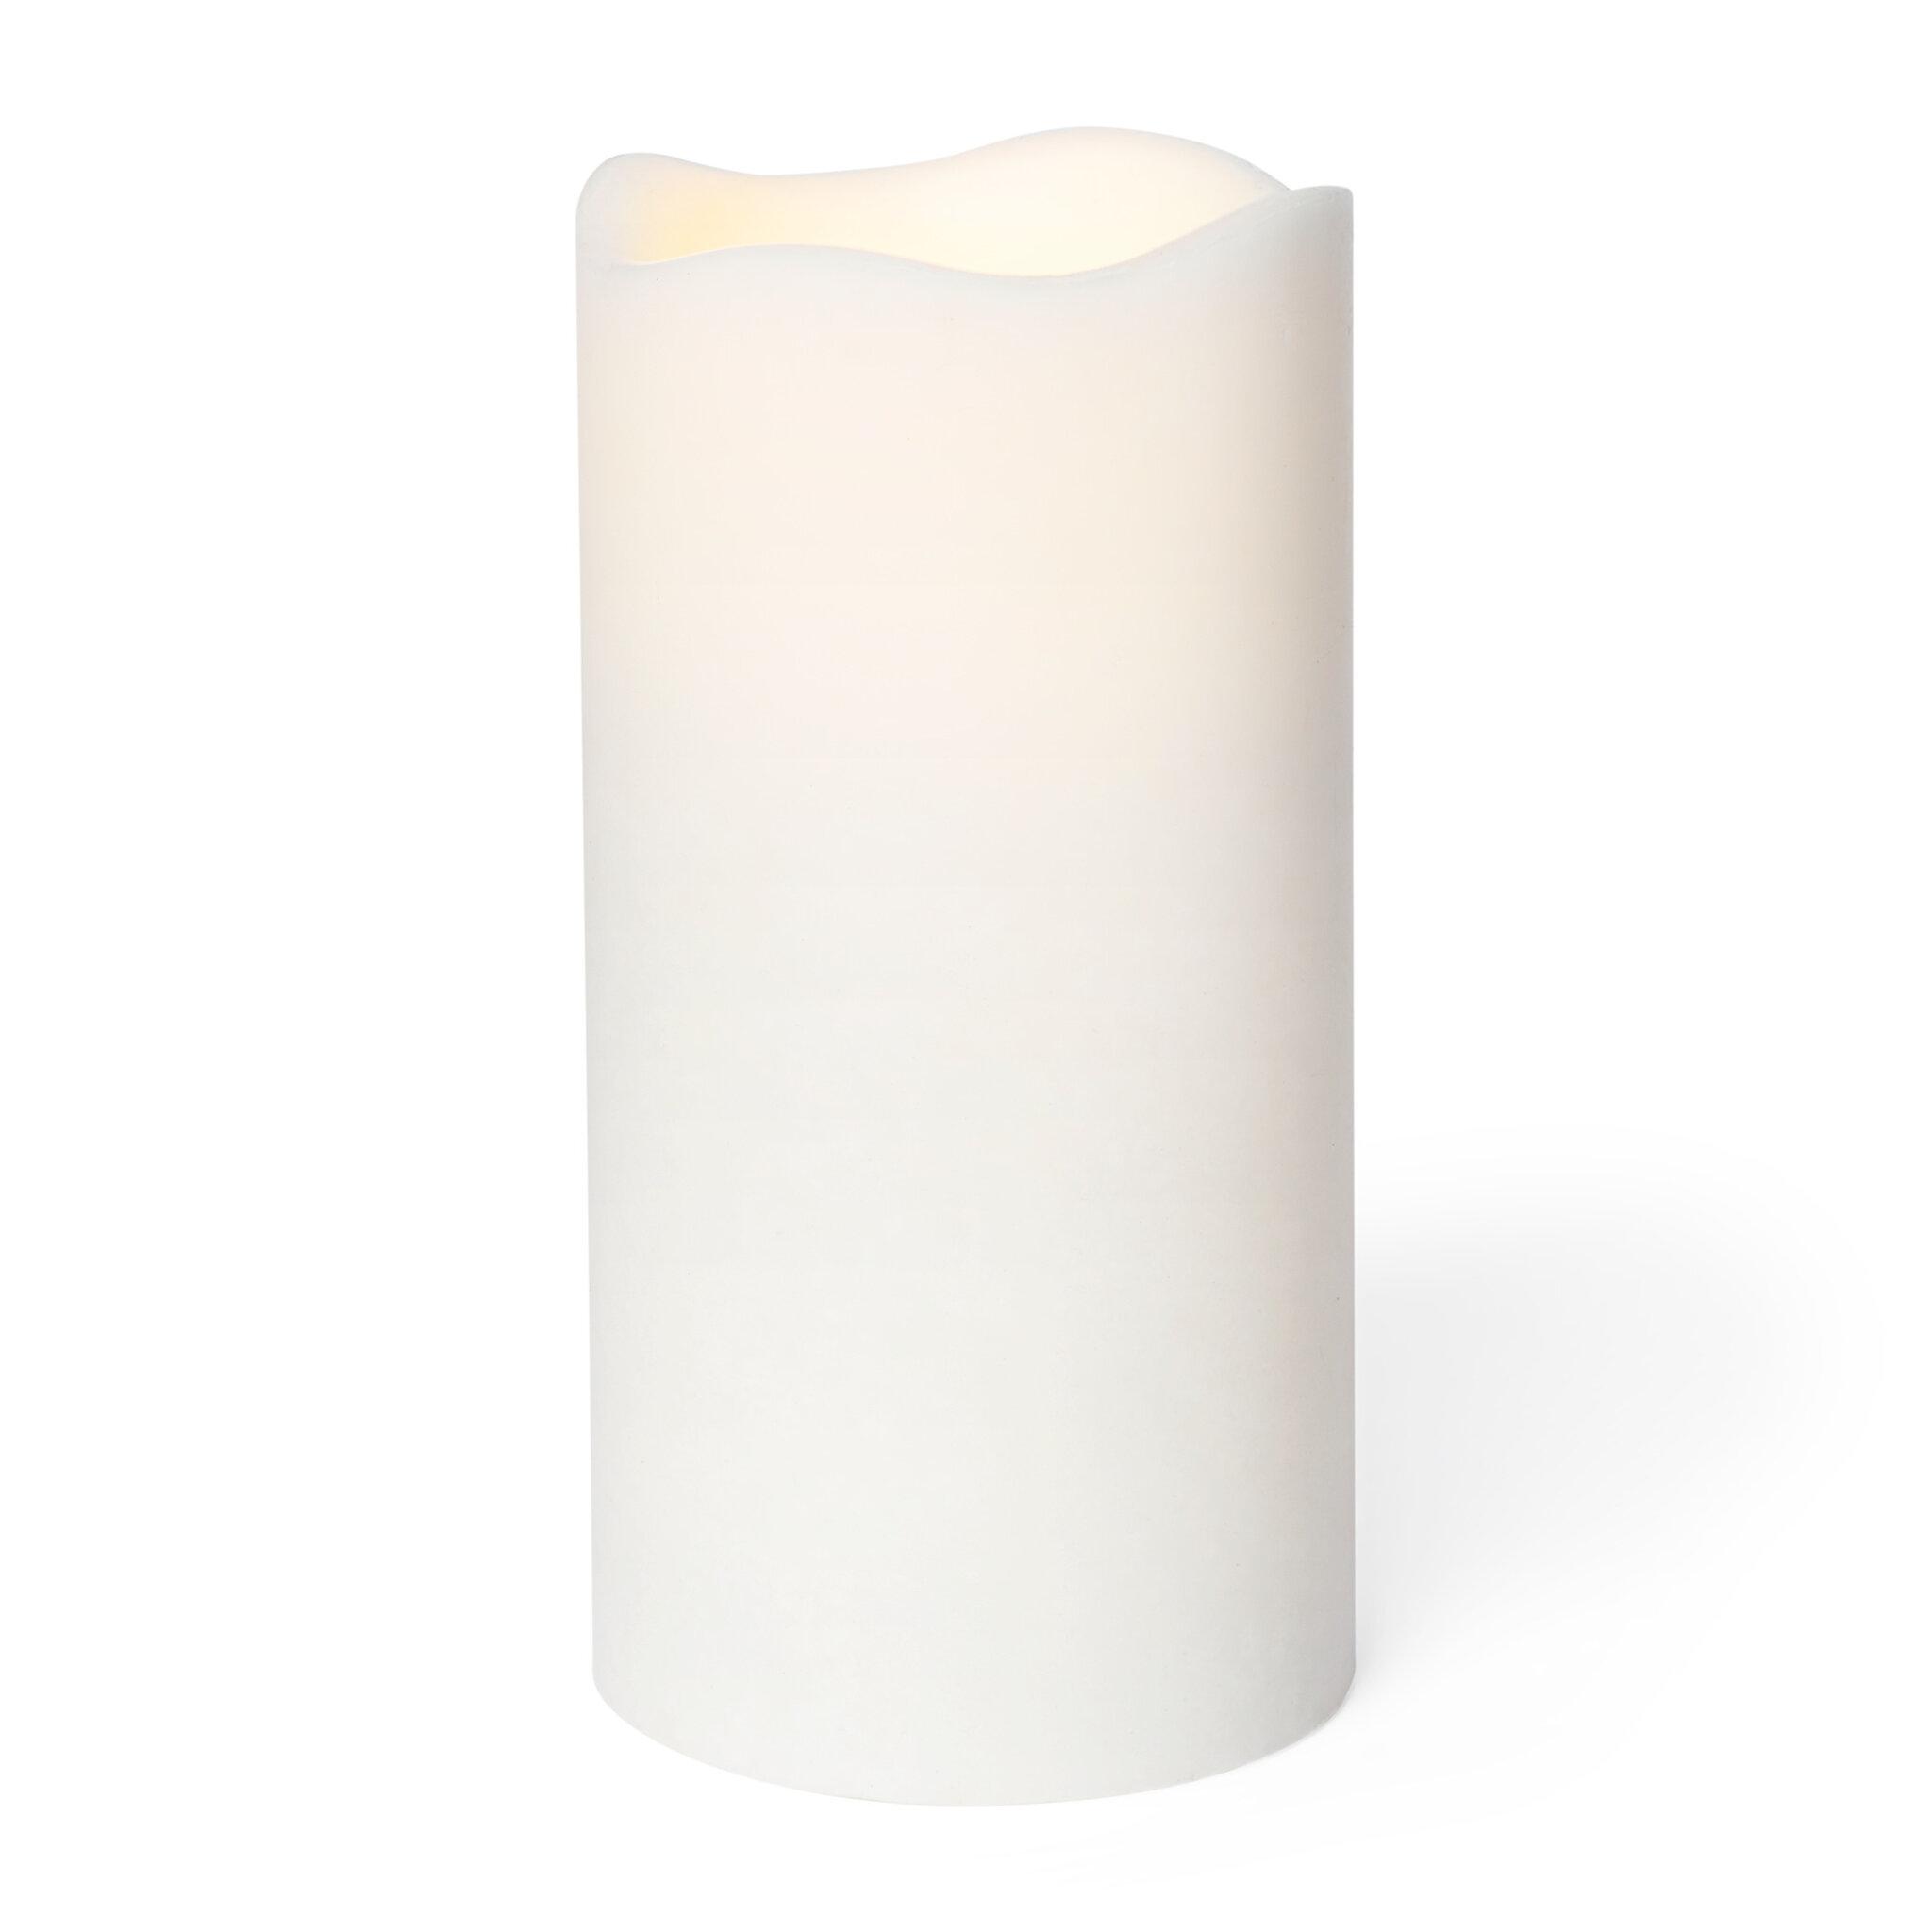 LED blockljus L 15x7,5 cm